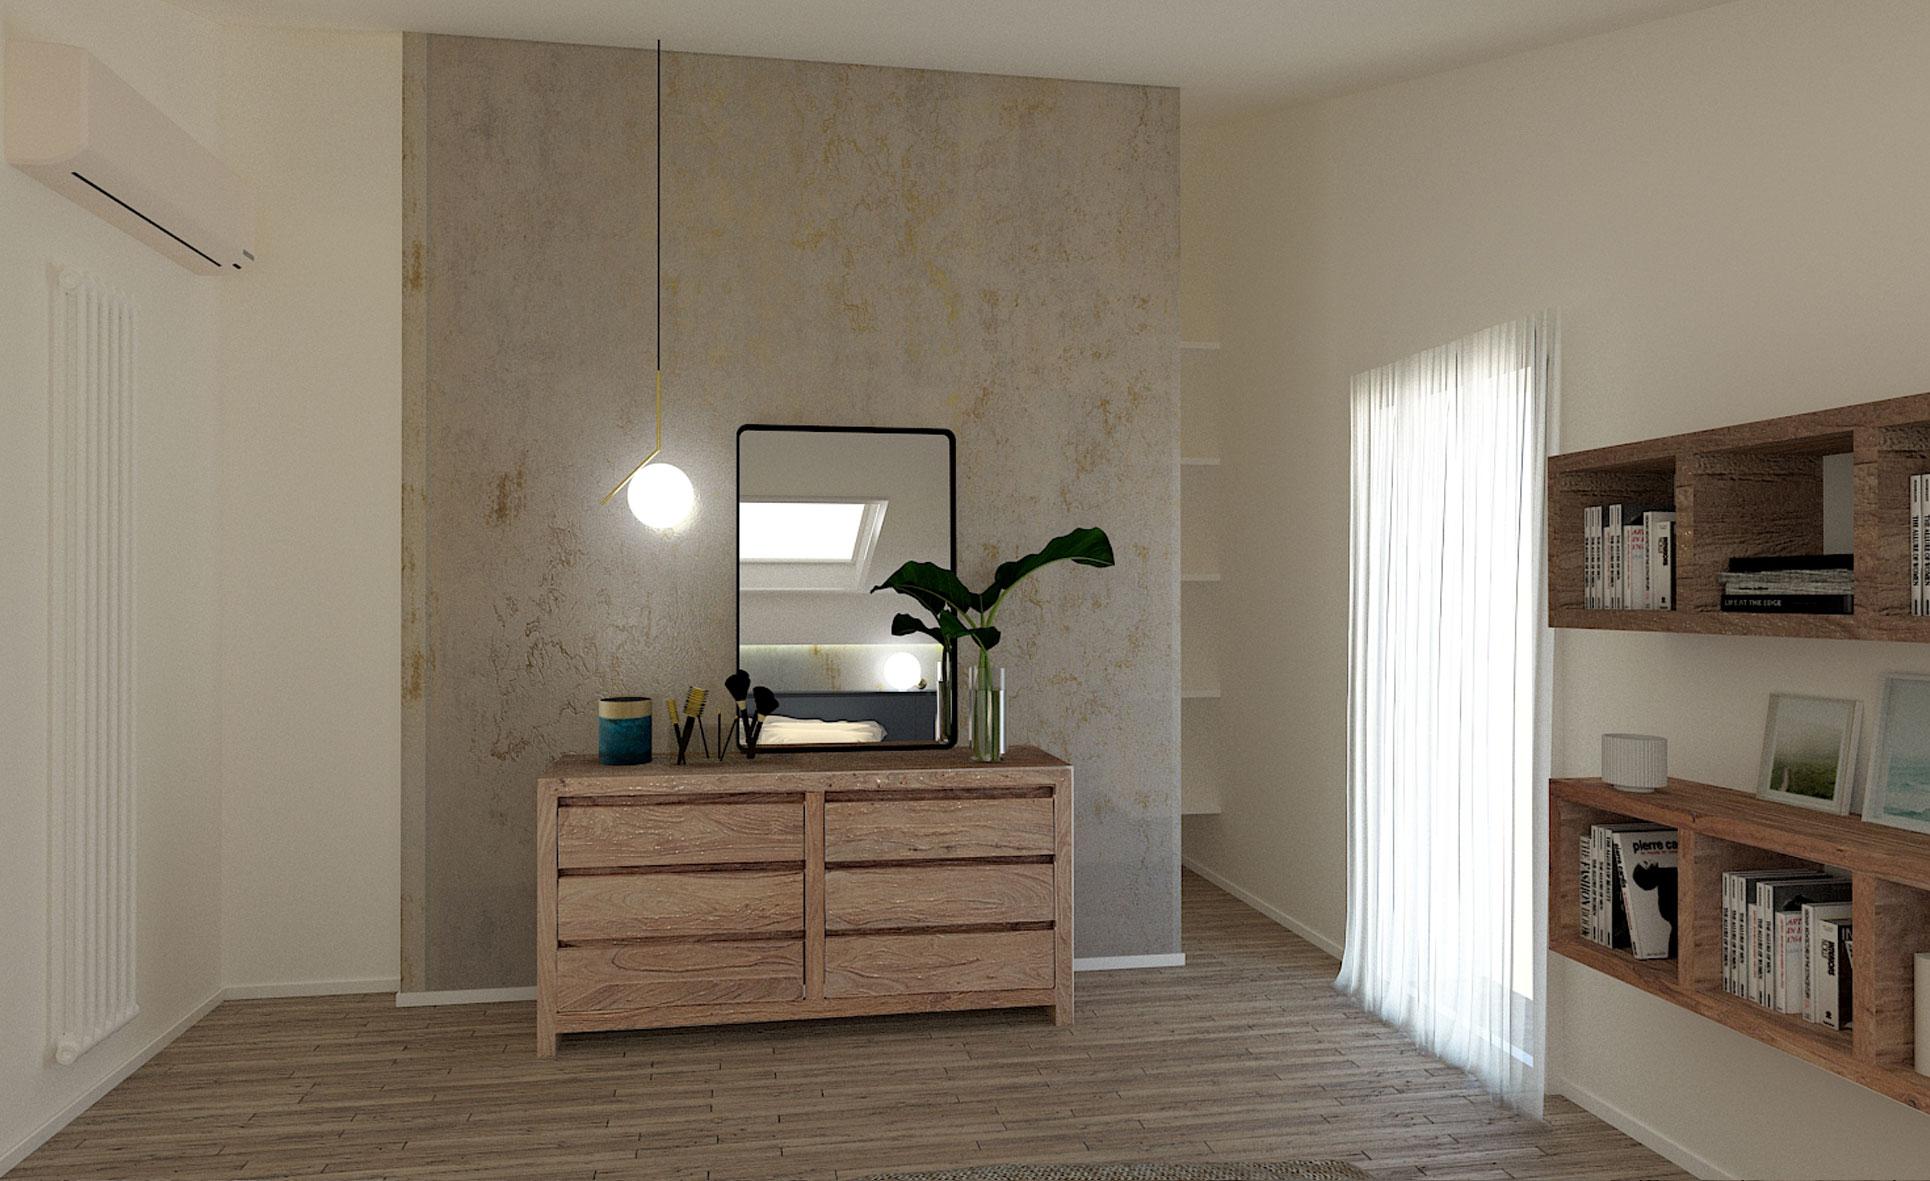 arredamento-arredo-interni-interior